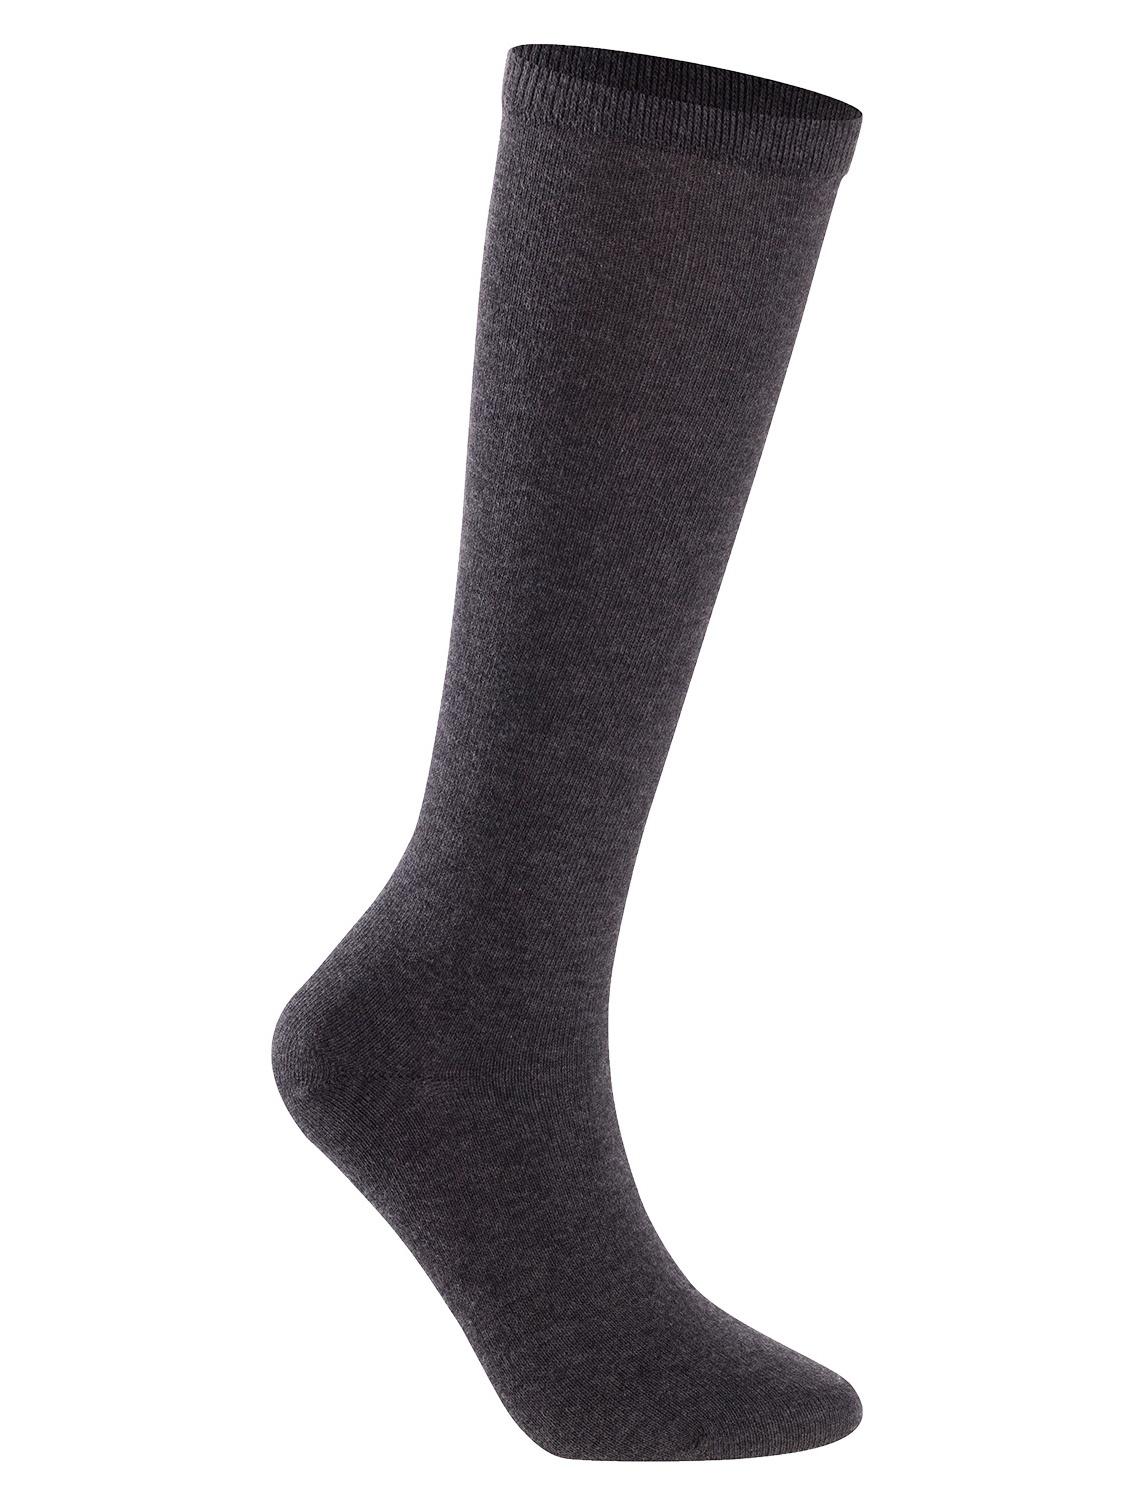 Lian LifeStyle Unisex Children 4 Pairs High Crew Combed Cotton Socks Medium (9Y-12Y) Dark Grey